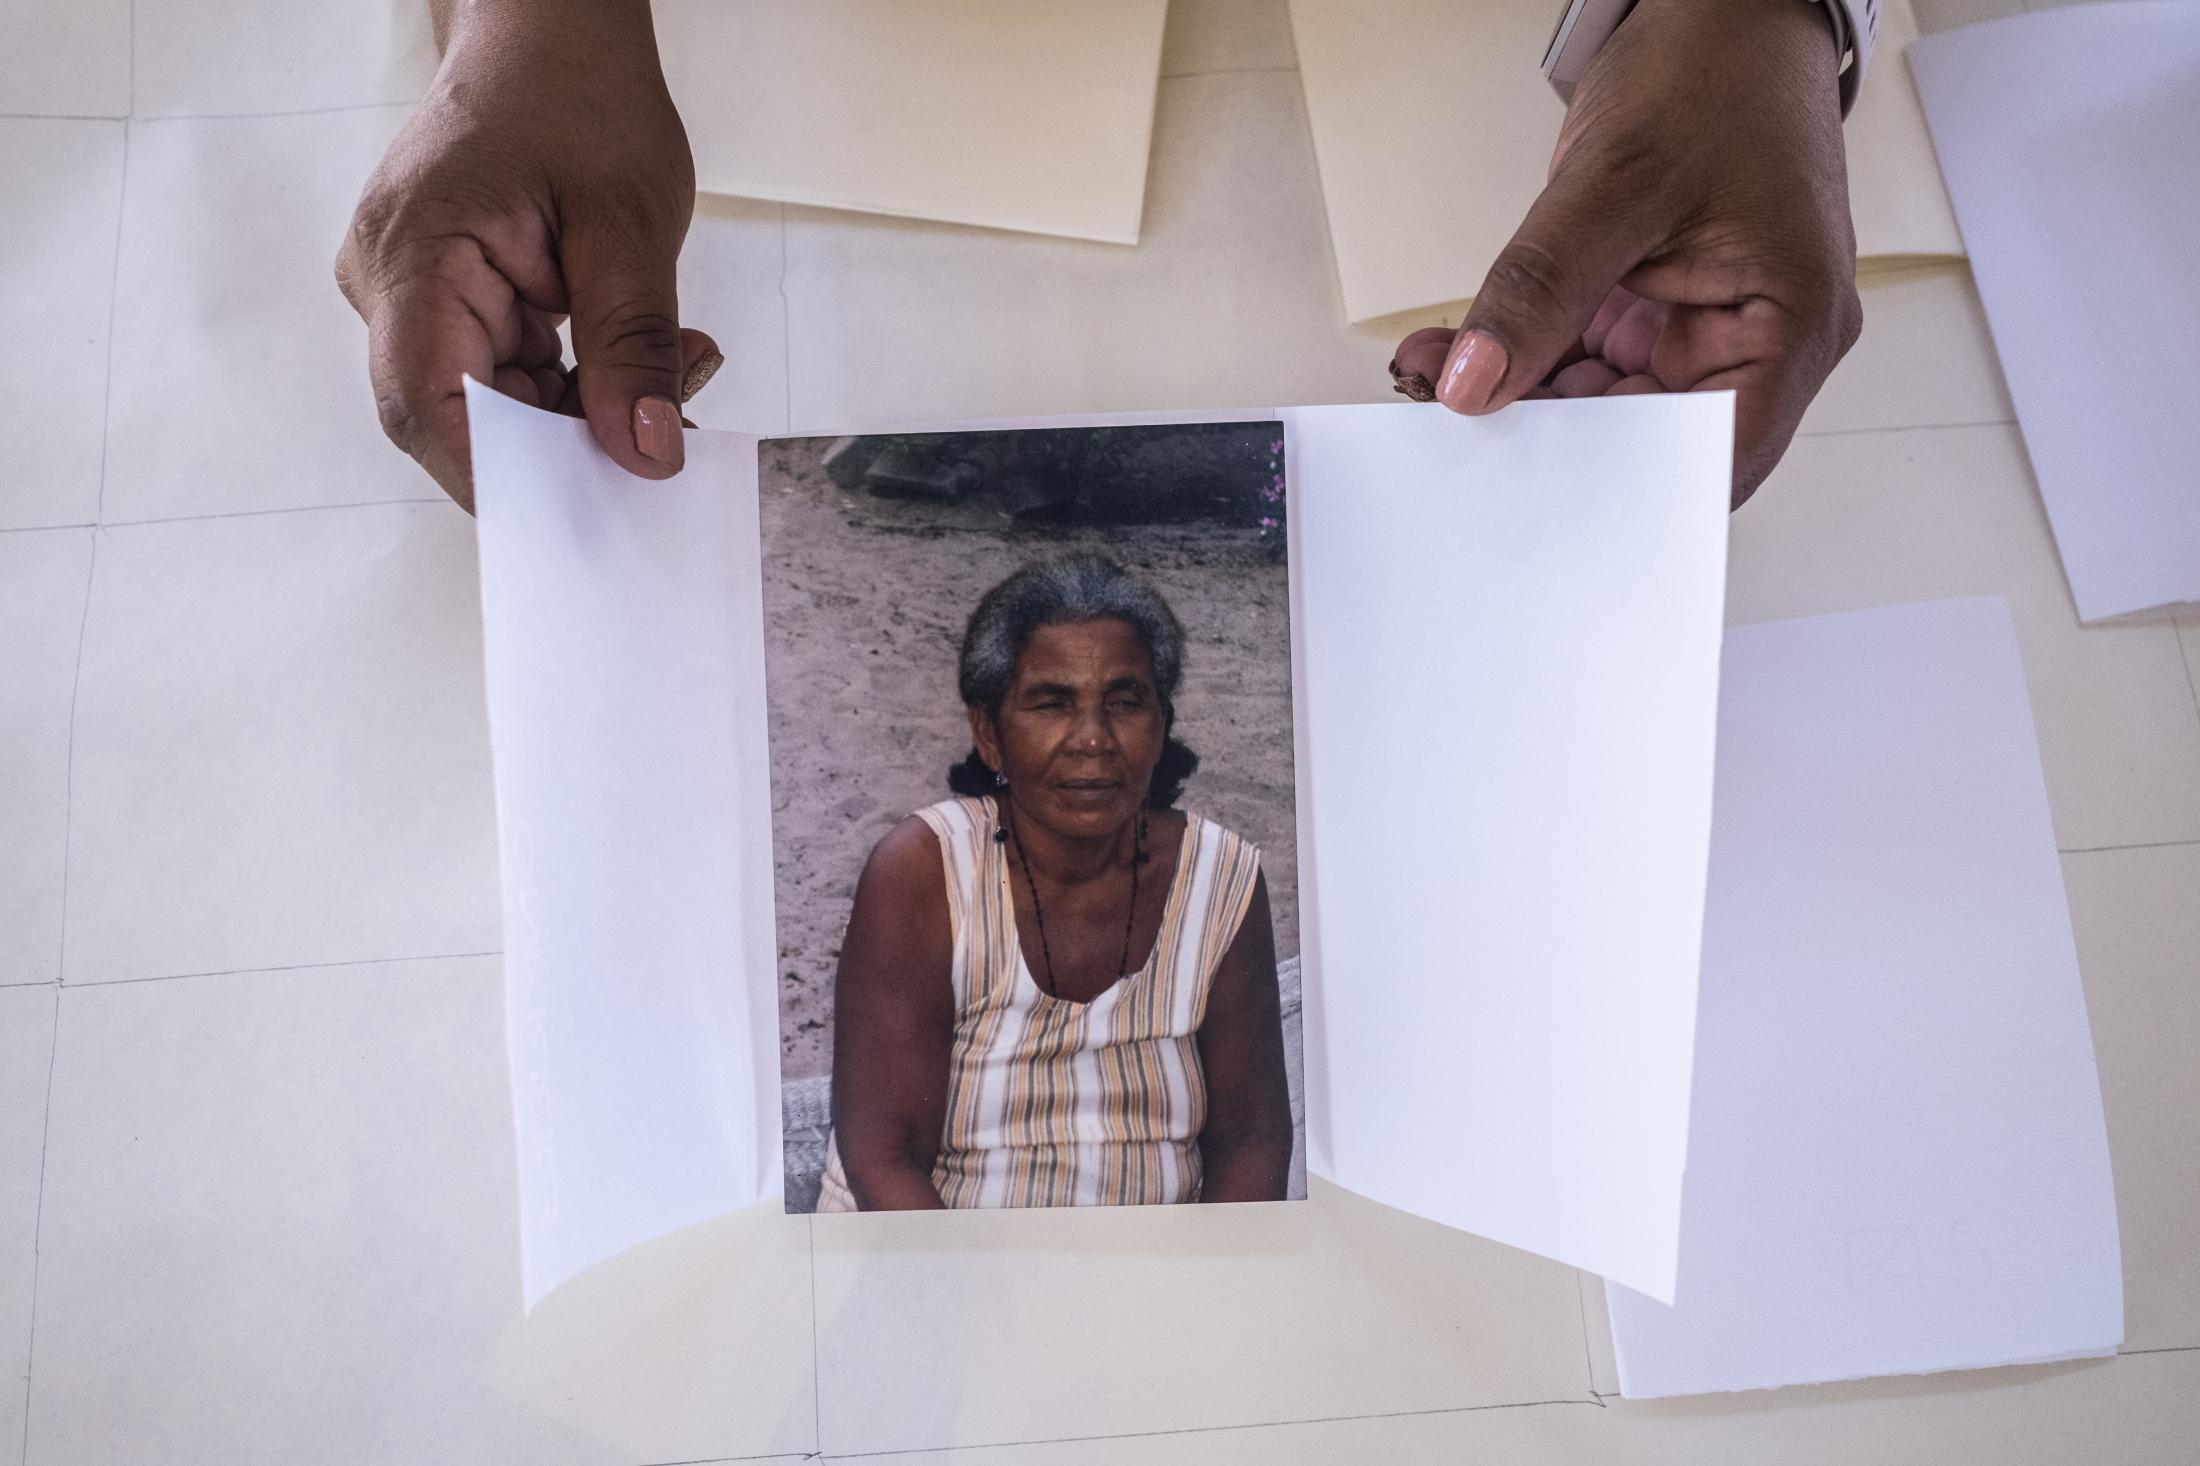 Art and Documentary Photography - Loading 15ALBUM_OAXACA_04ALBUM_OAXACA_DSCF8876.jpg